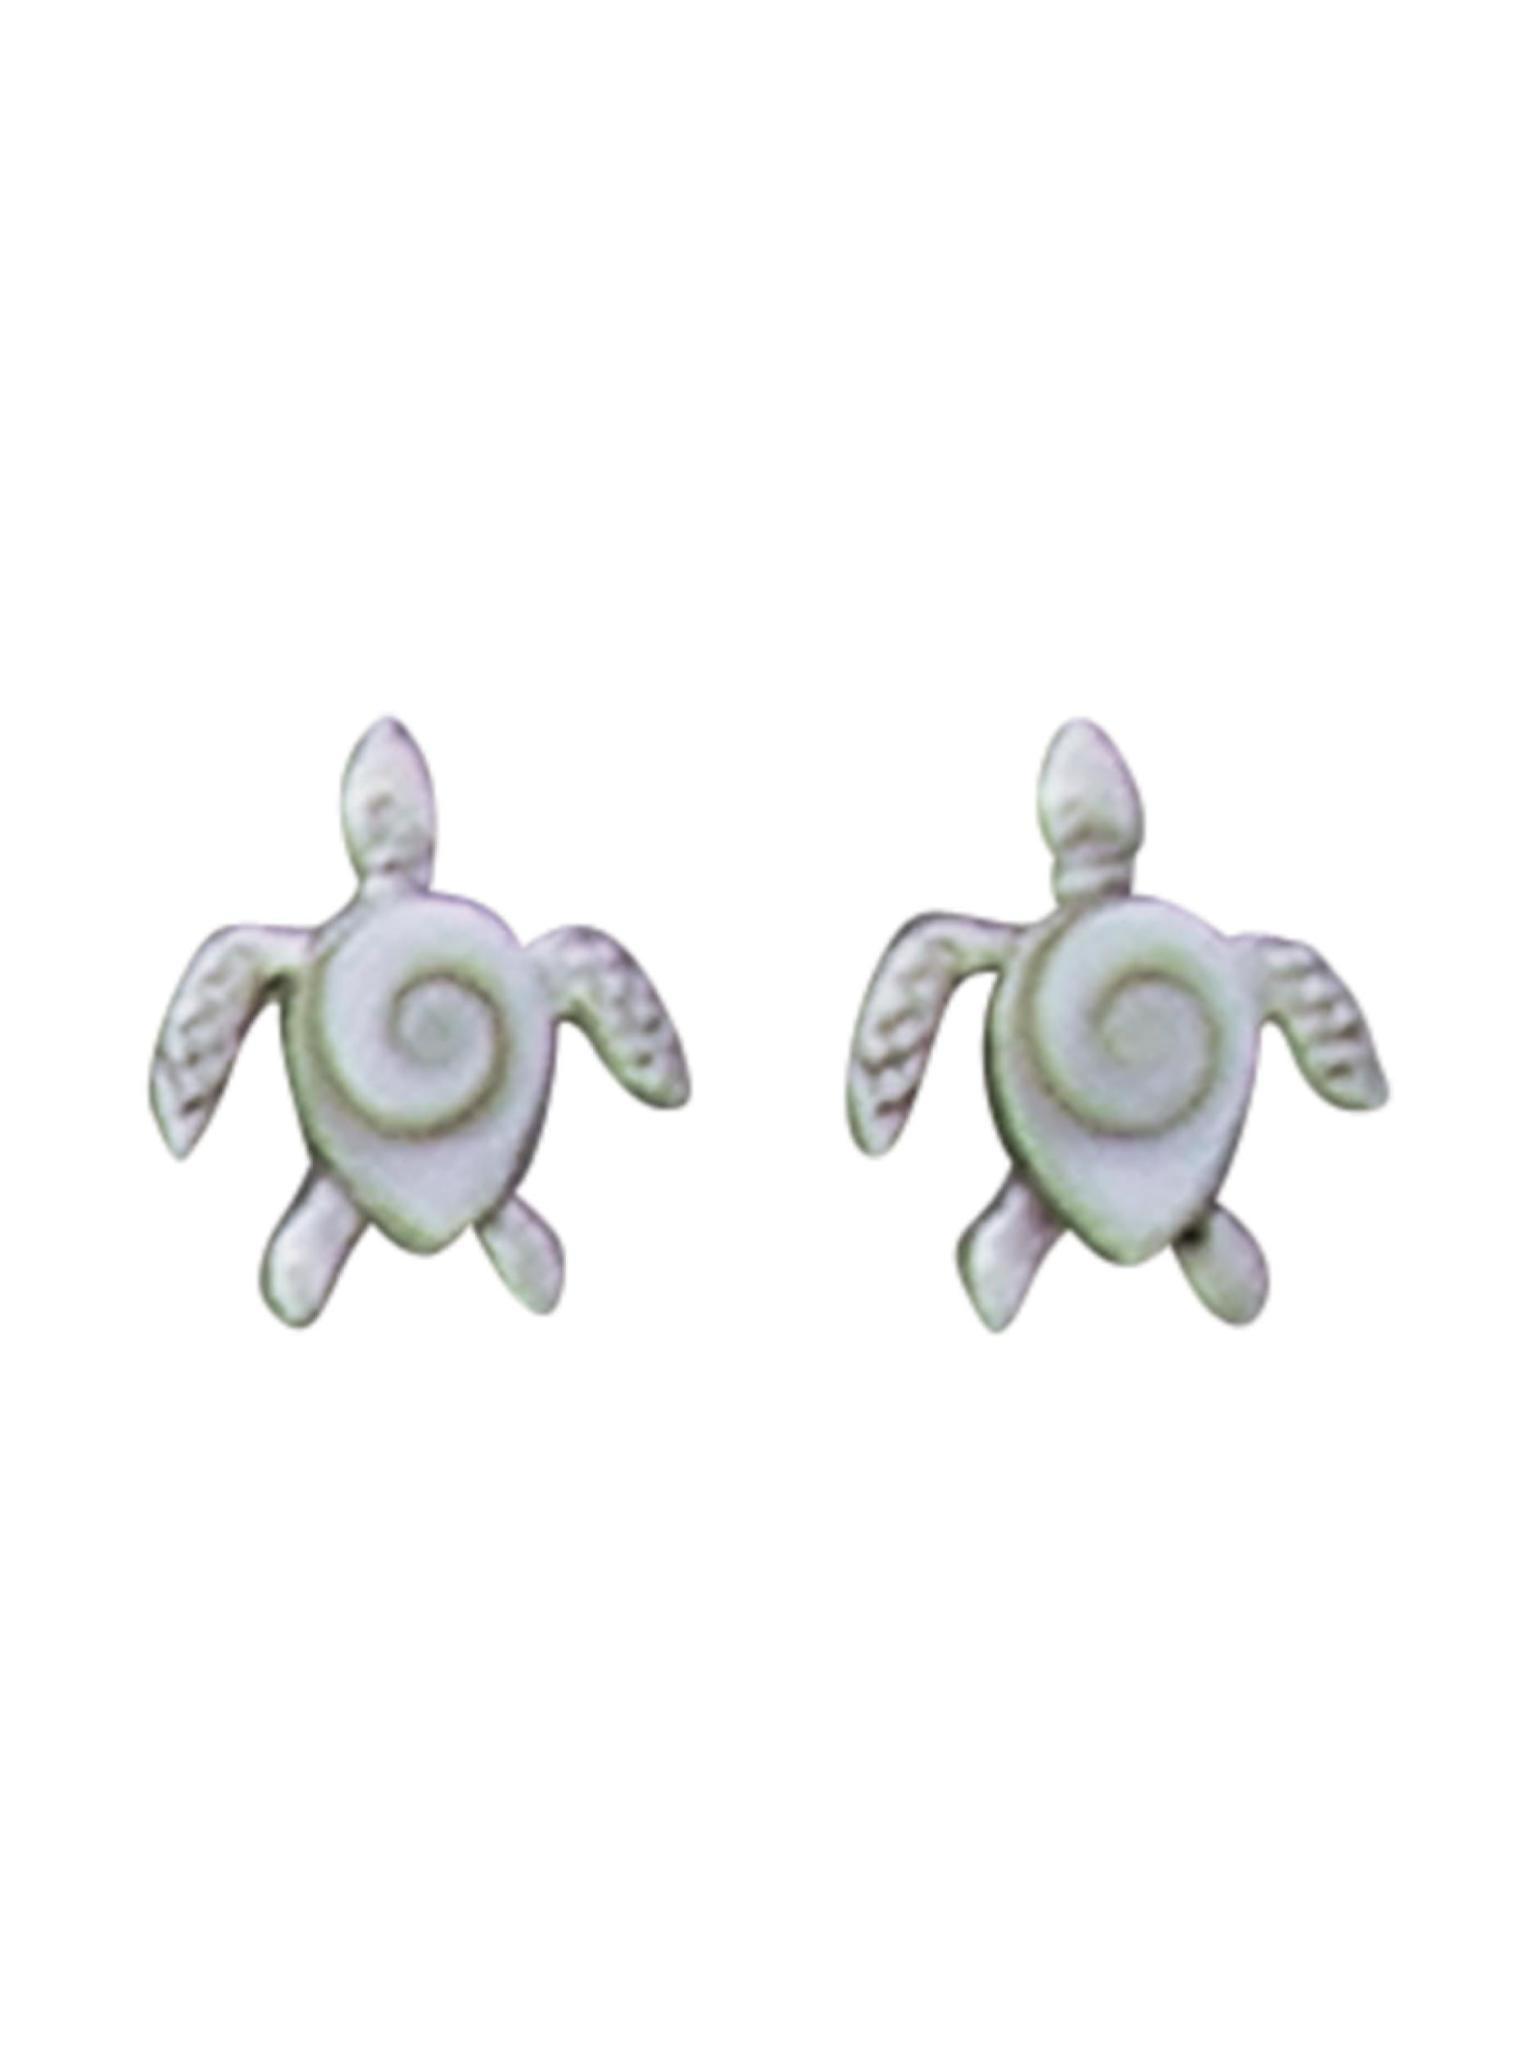 Acomo Jewelry Turtle Ear Stud w/ Shiva Shell